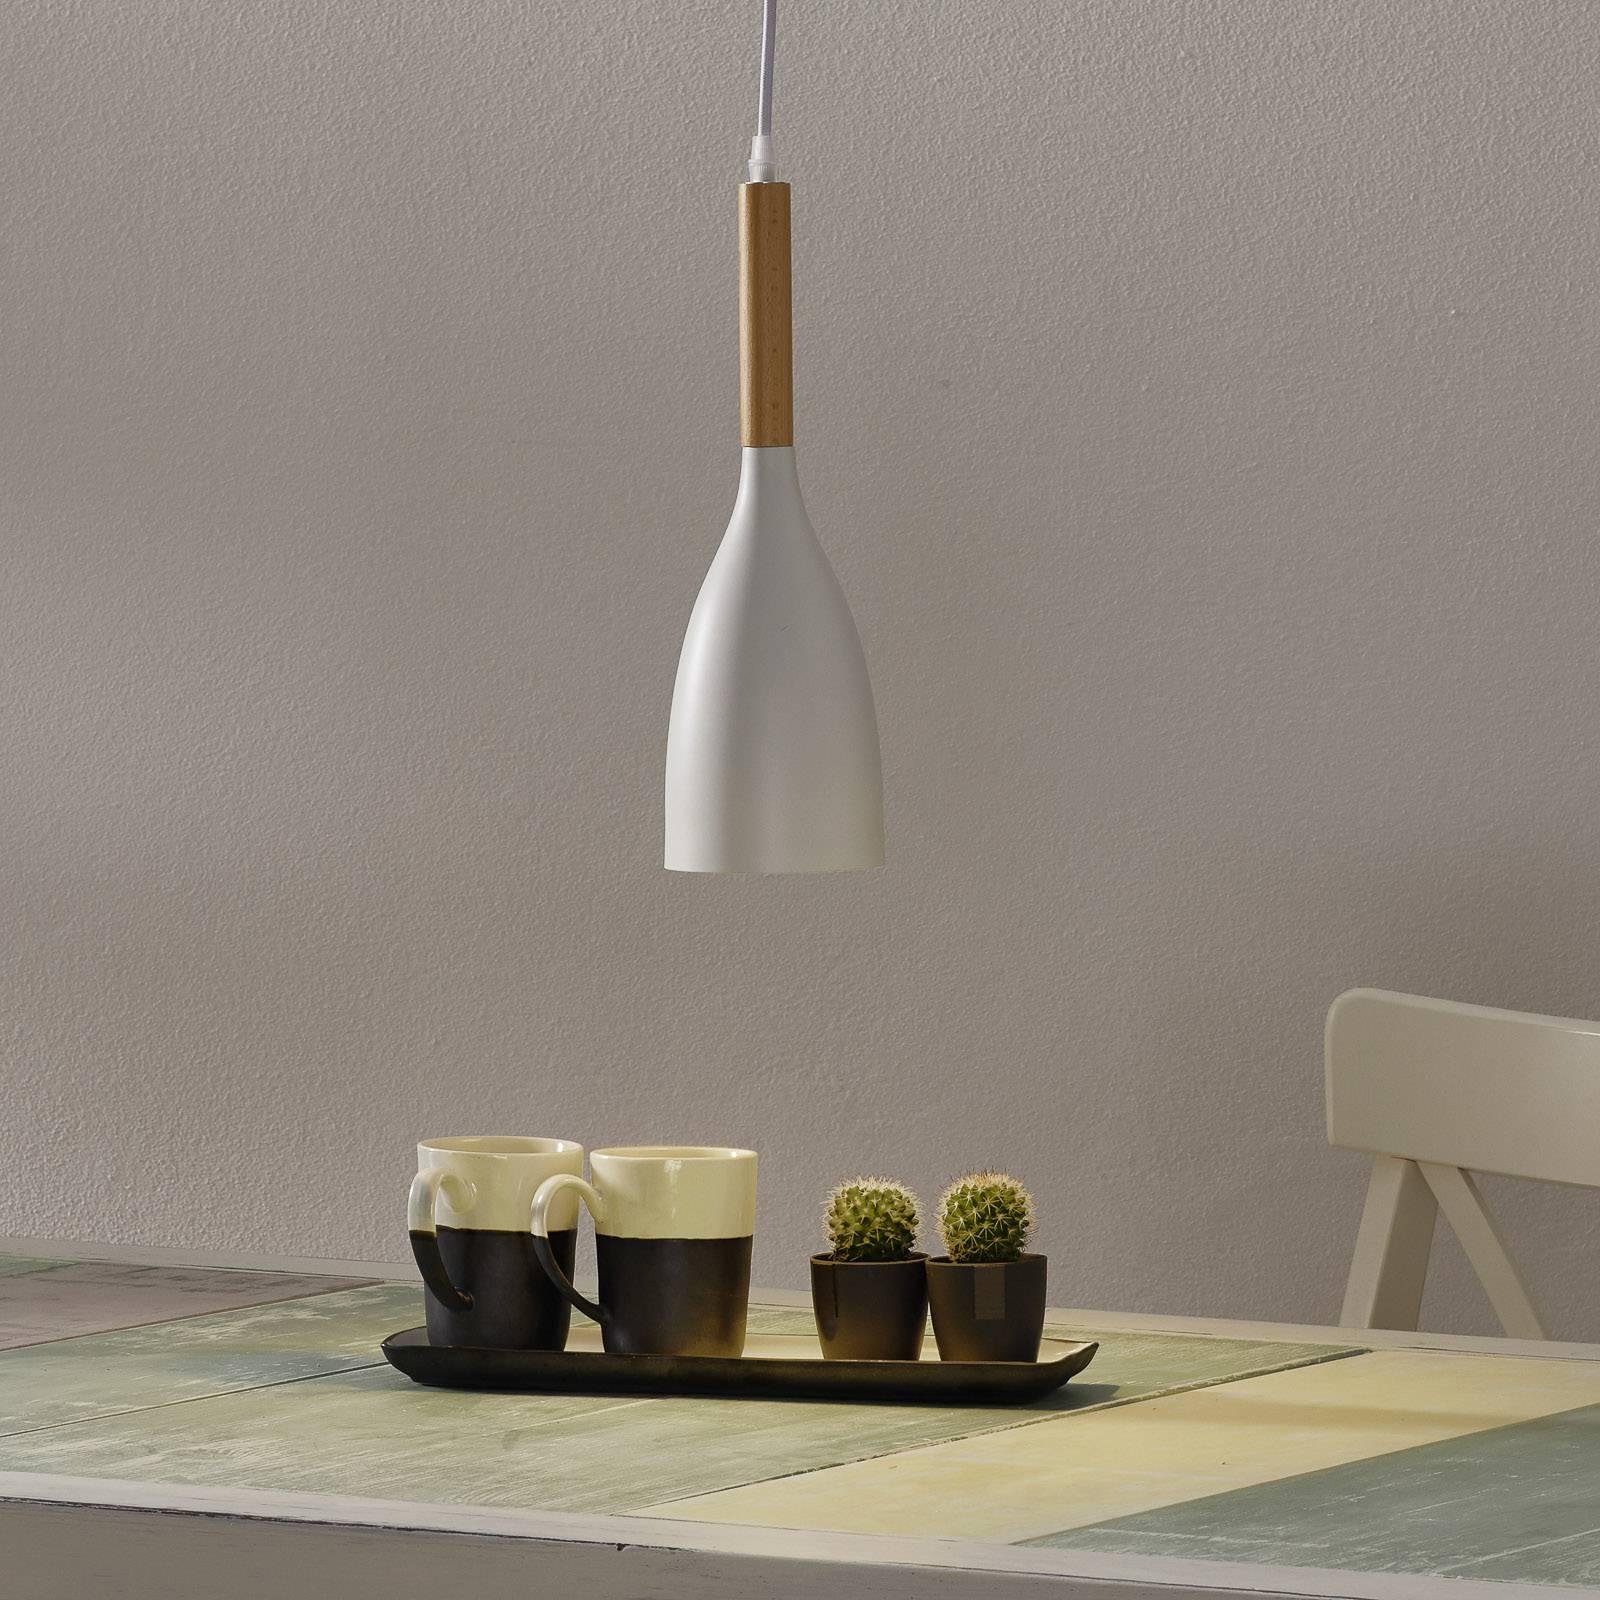 Hanglamp Manhattan met houtdetail, wit